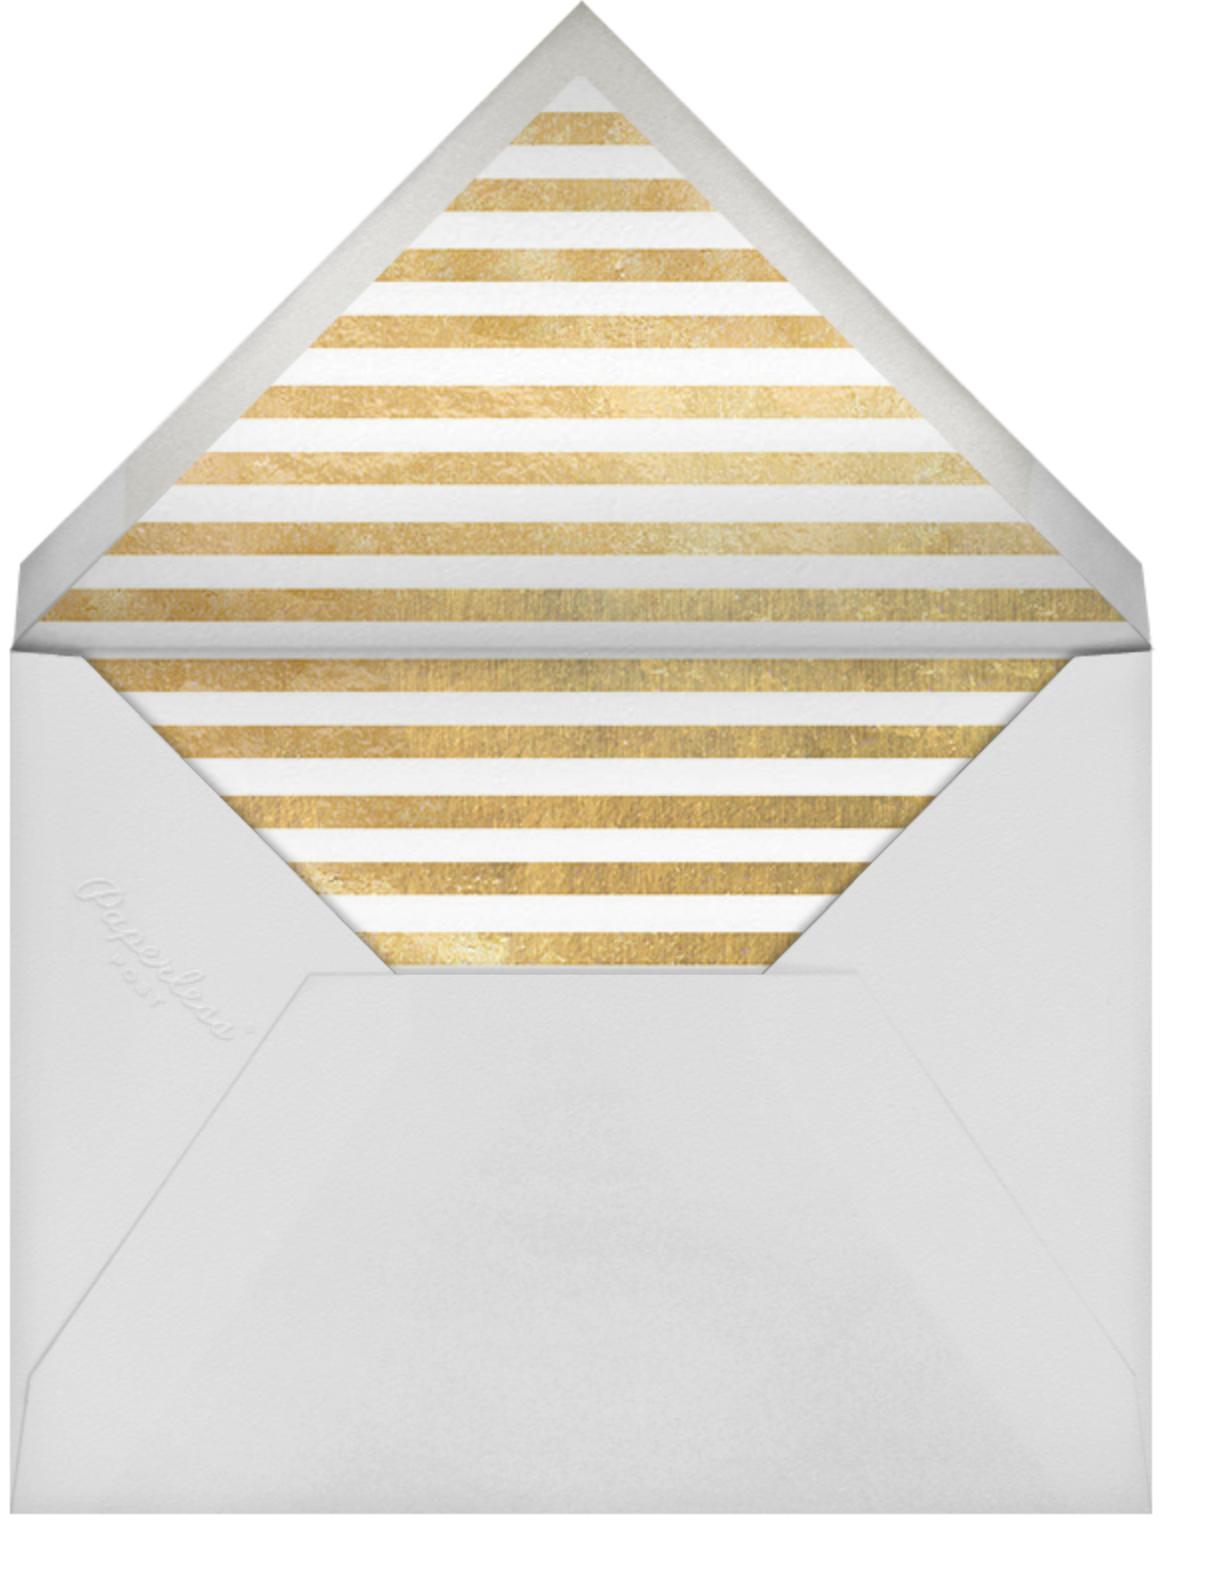 Evergreen Stripes - Gold/White - kate spade new york - Happy hour - envelope back